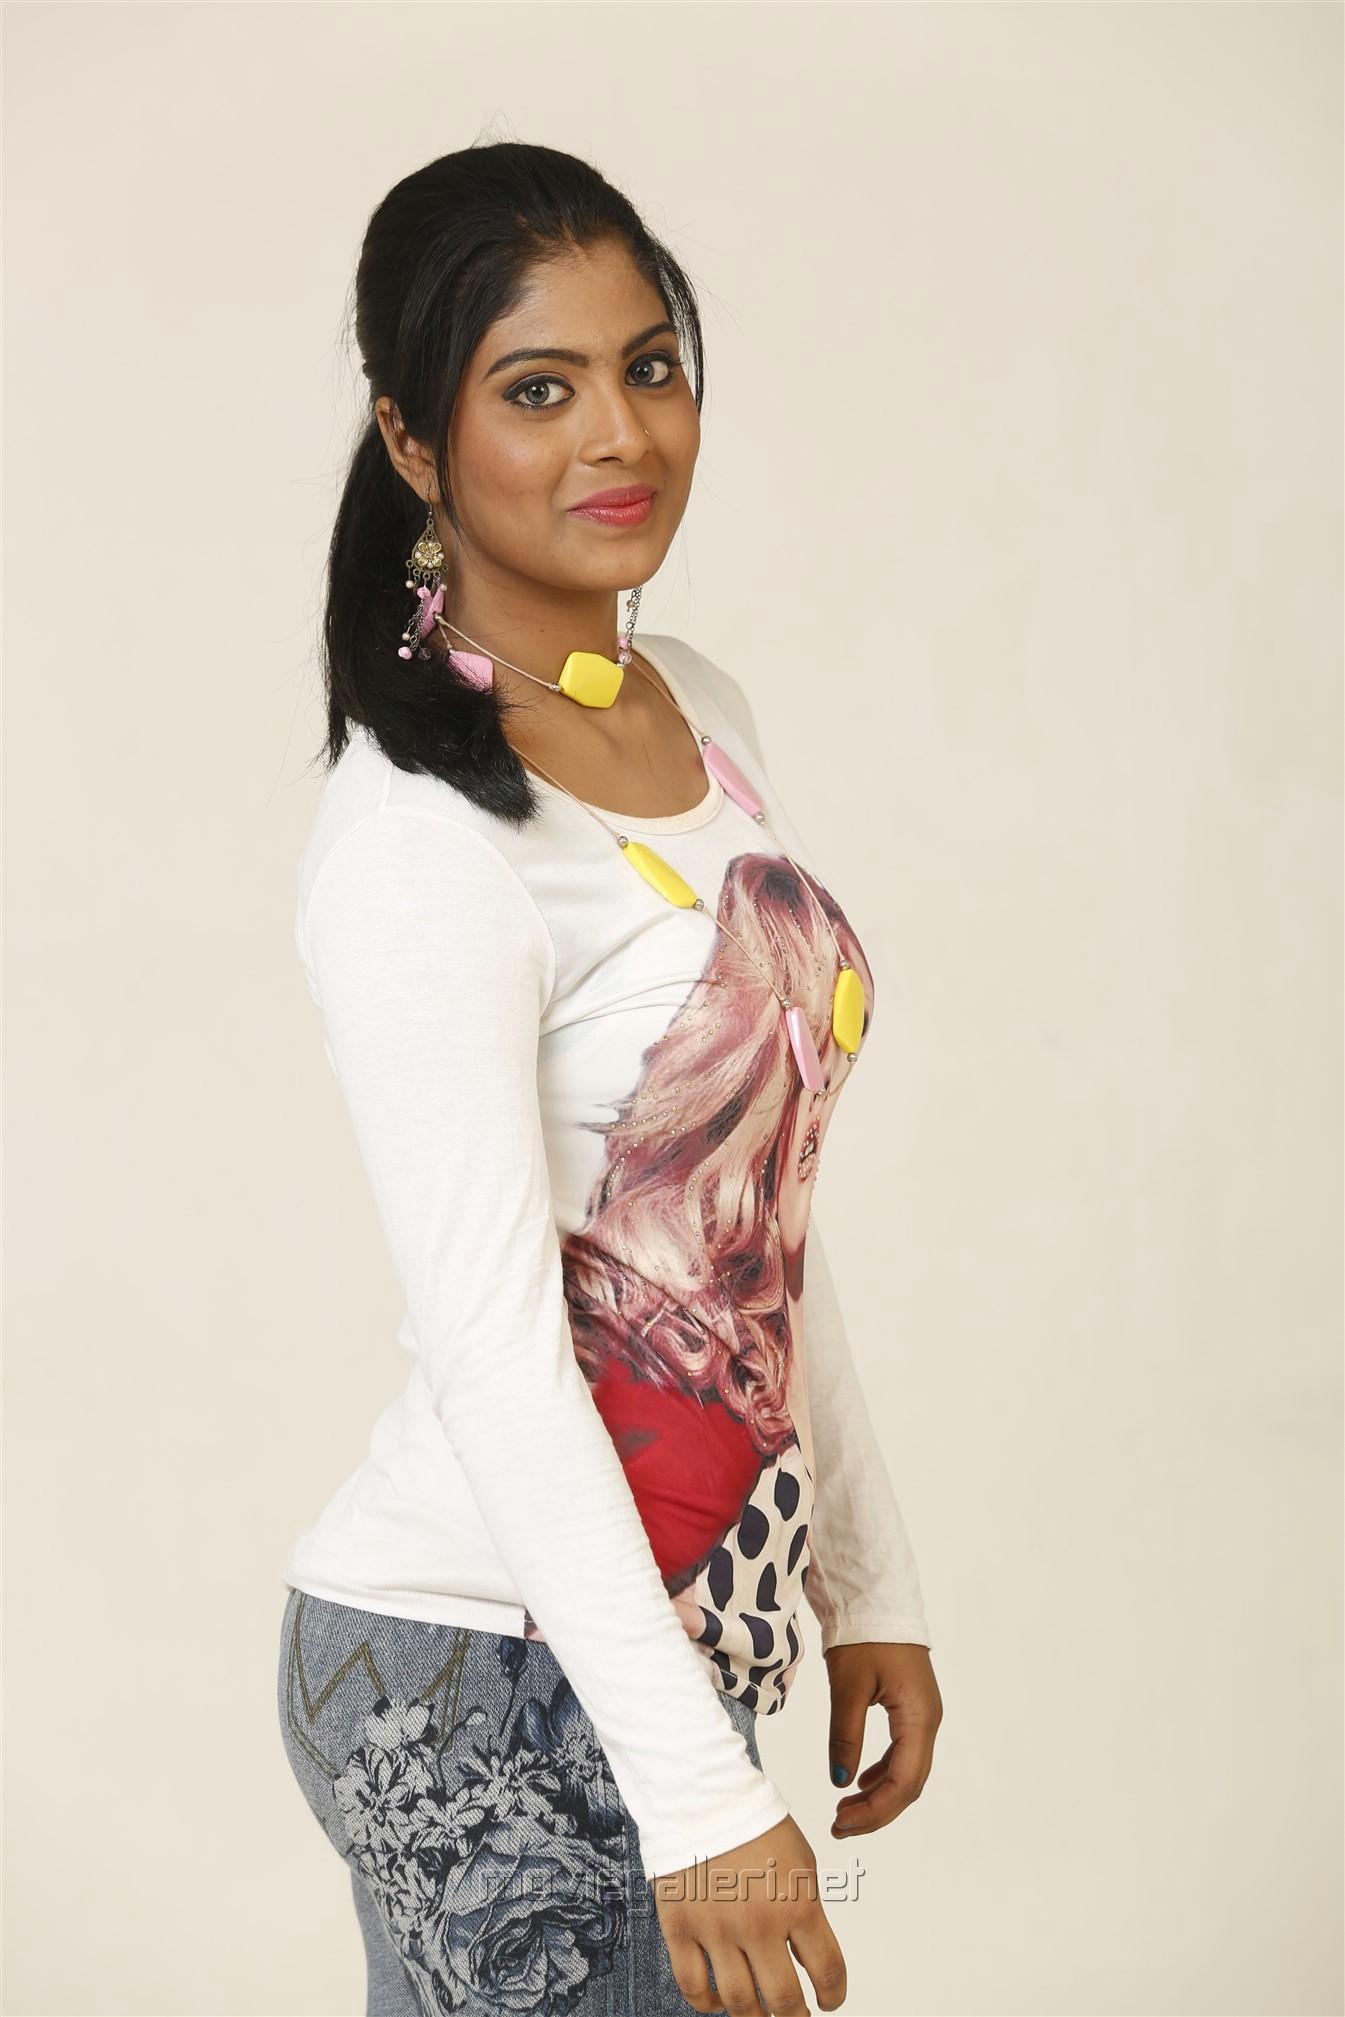 Actress Varshita in EPCo 302 Movie Stills HD